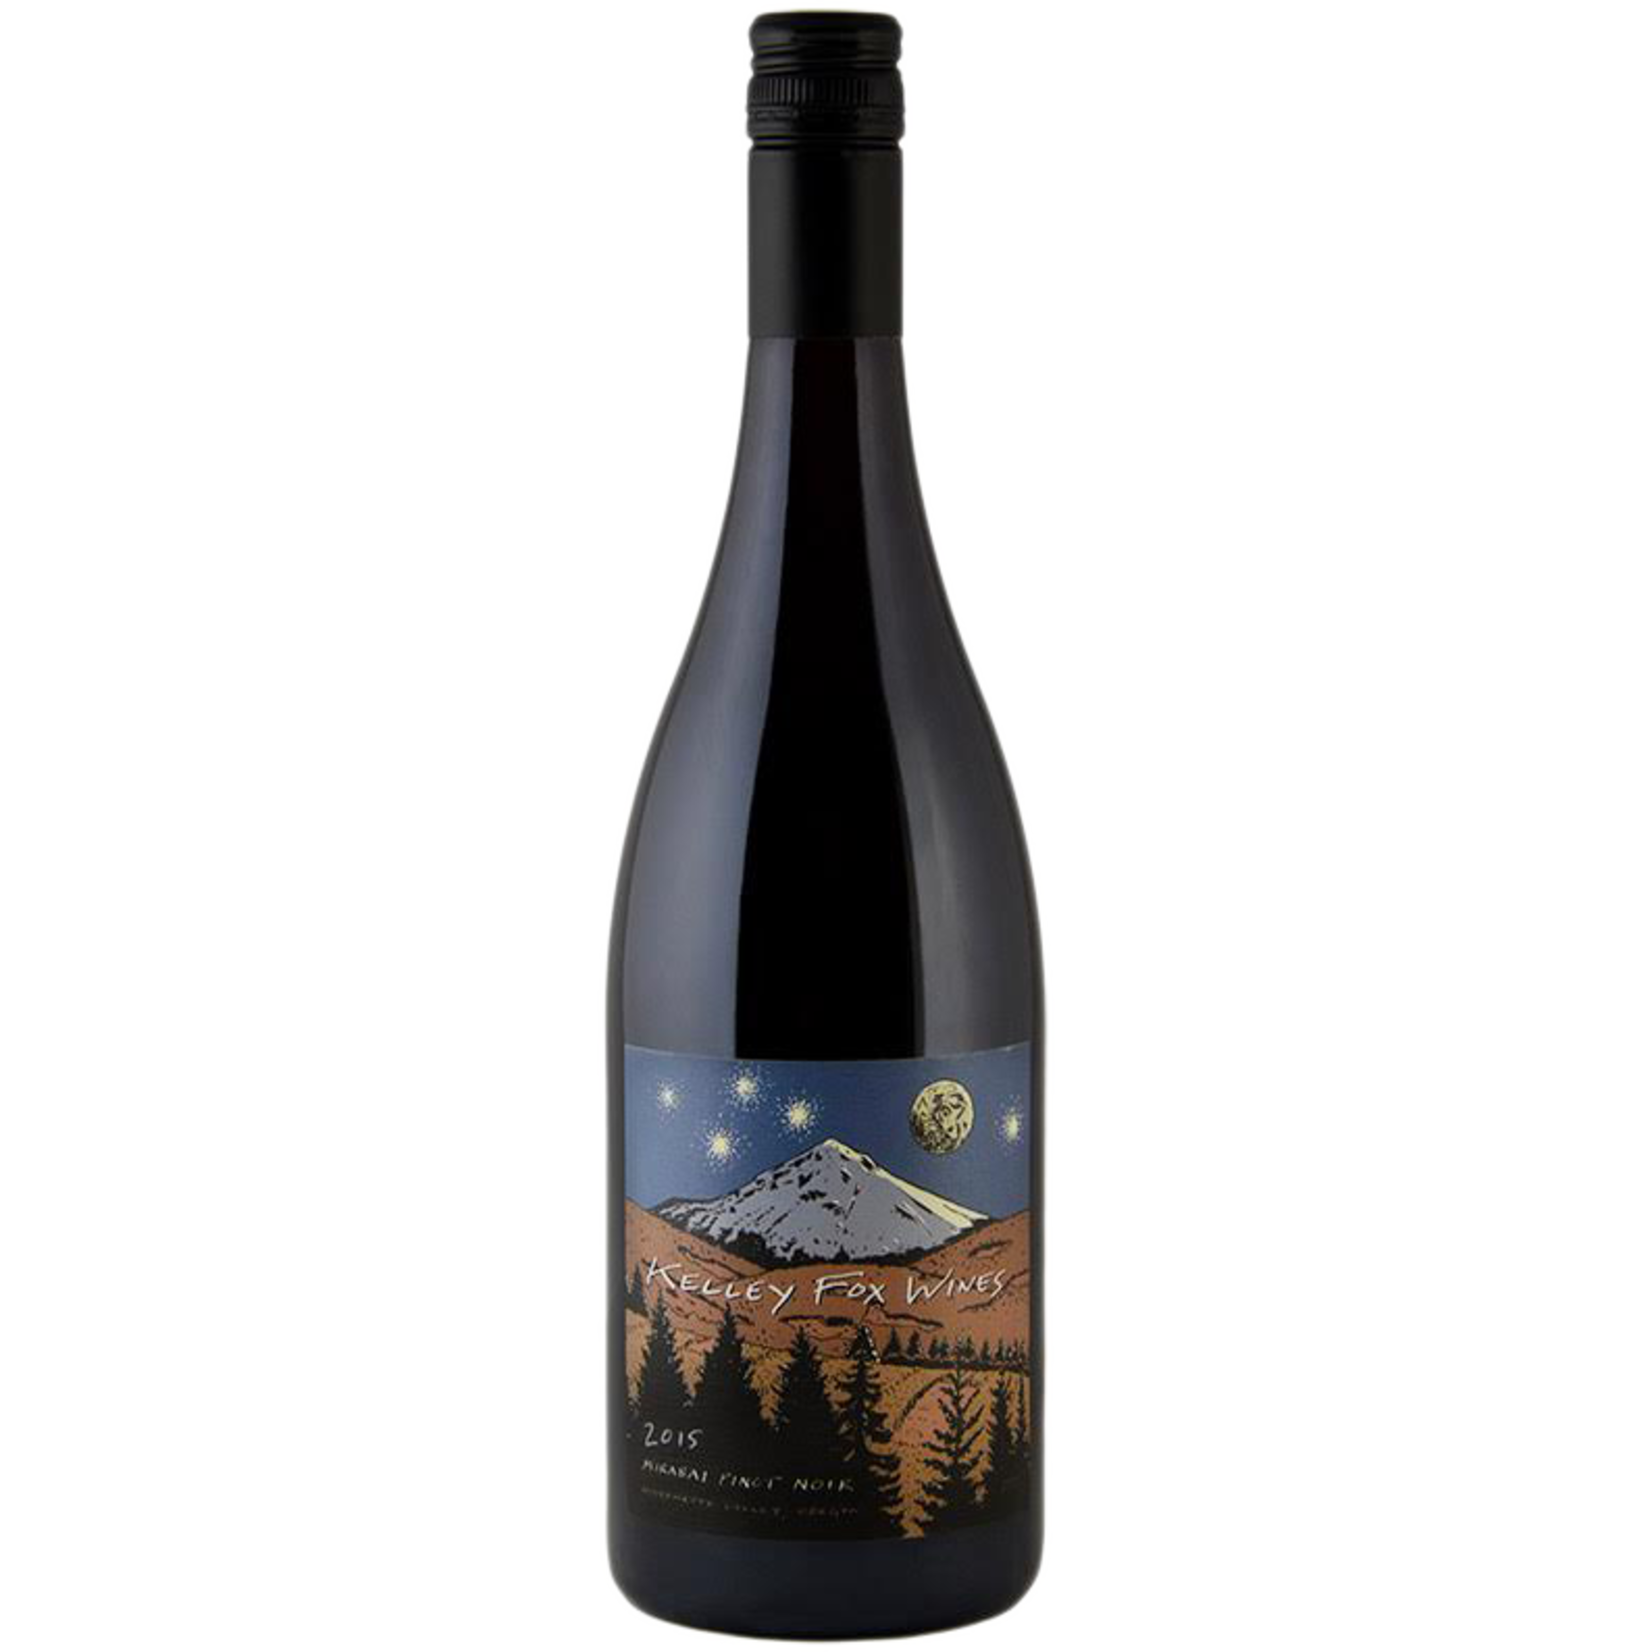 Kelley Fox Wines Willamette Valley Pinot Noir Mirabai 2017